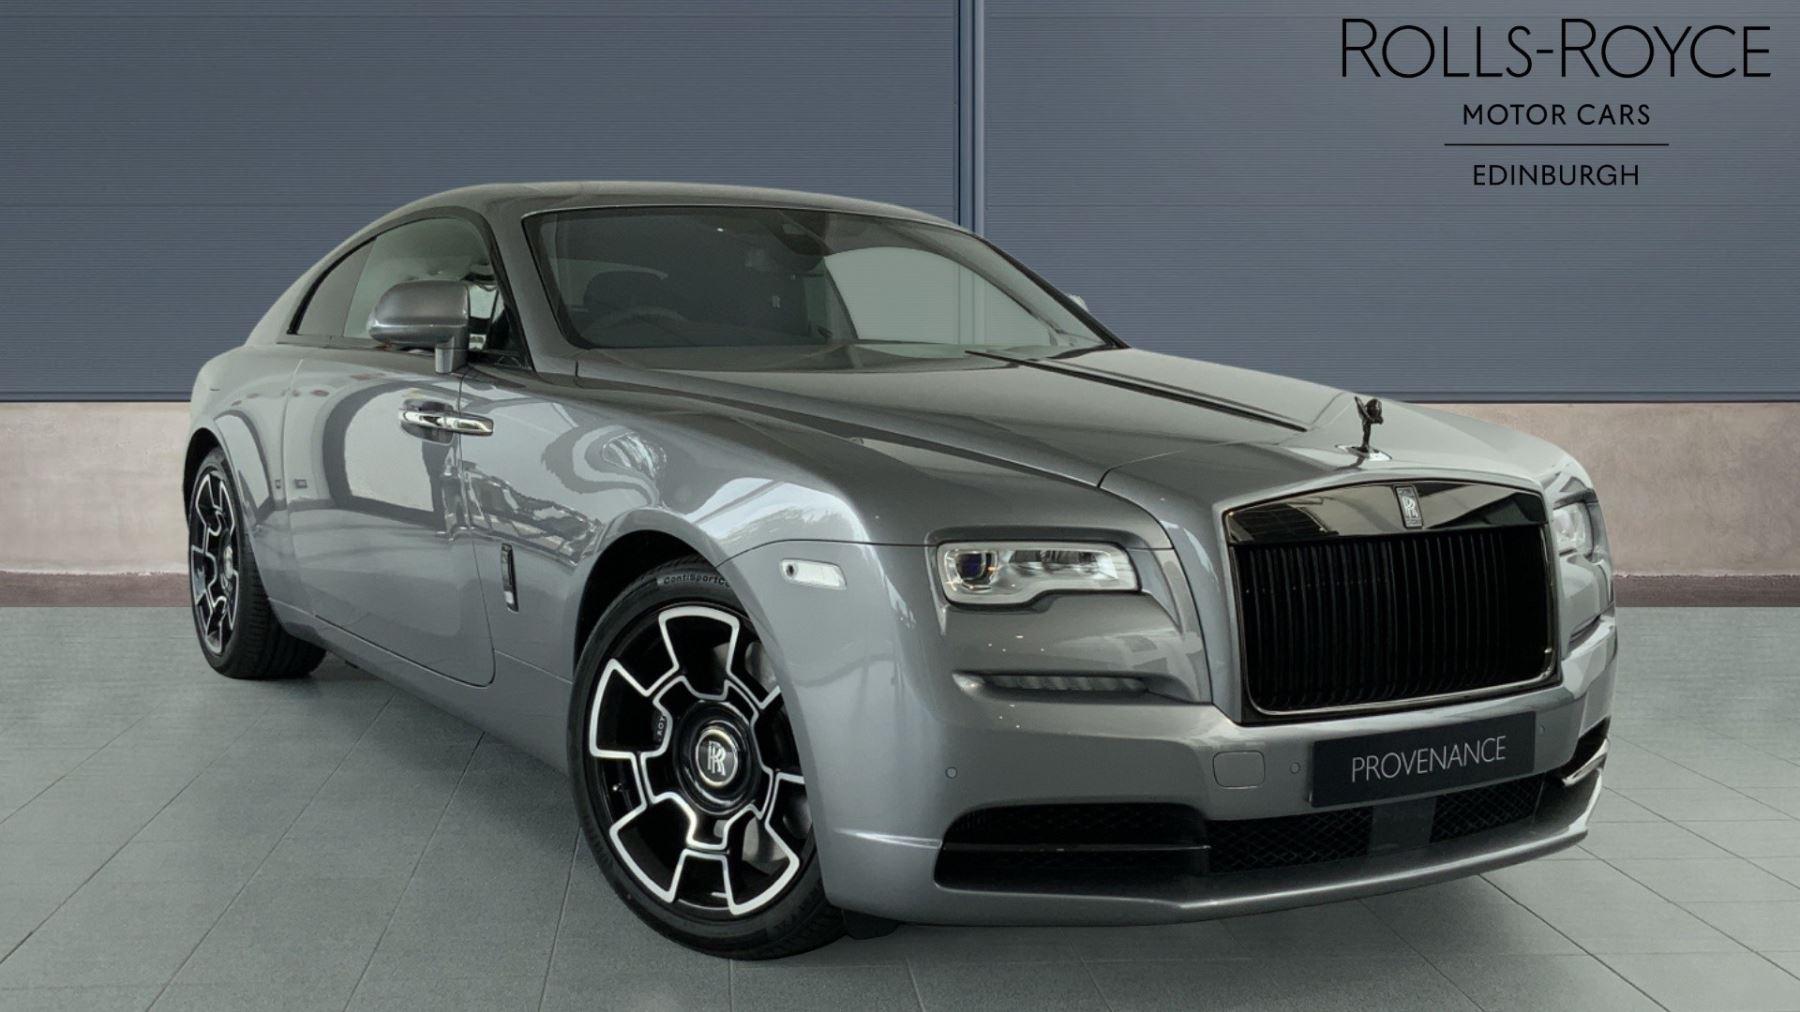 Rolls-Royce Black Badge Wraith V12 6.6 Automatic 2 door Coupe (2021)